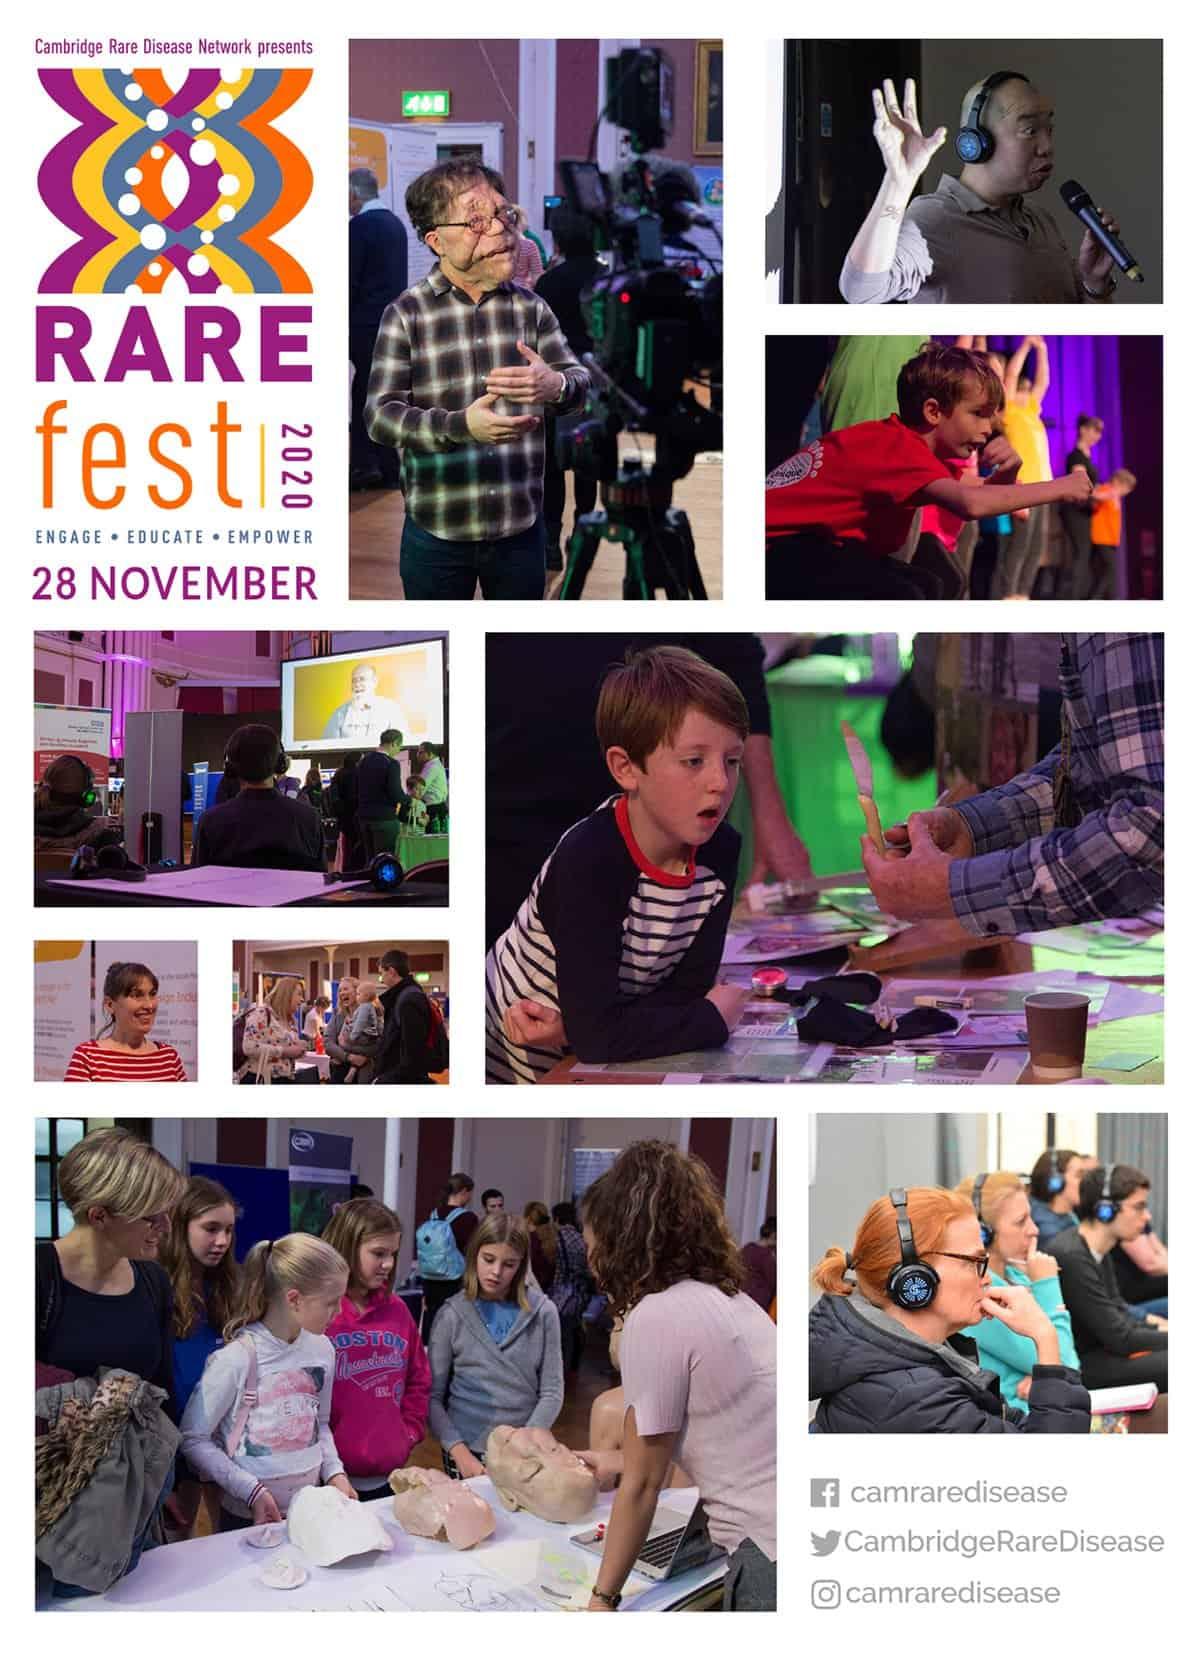 RAREfest2020 promo images